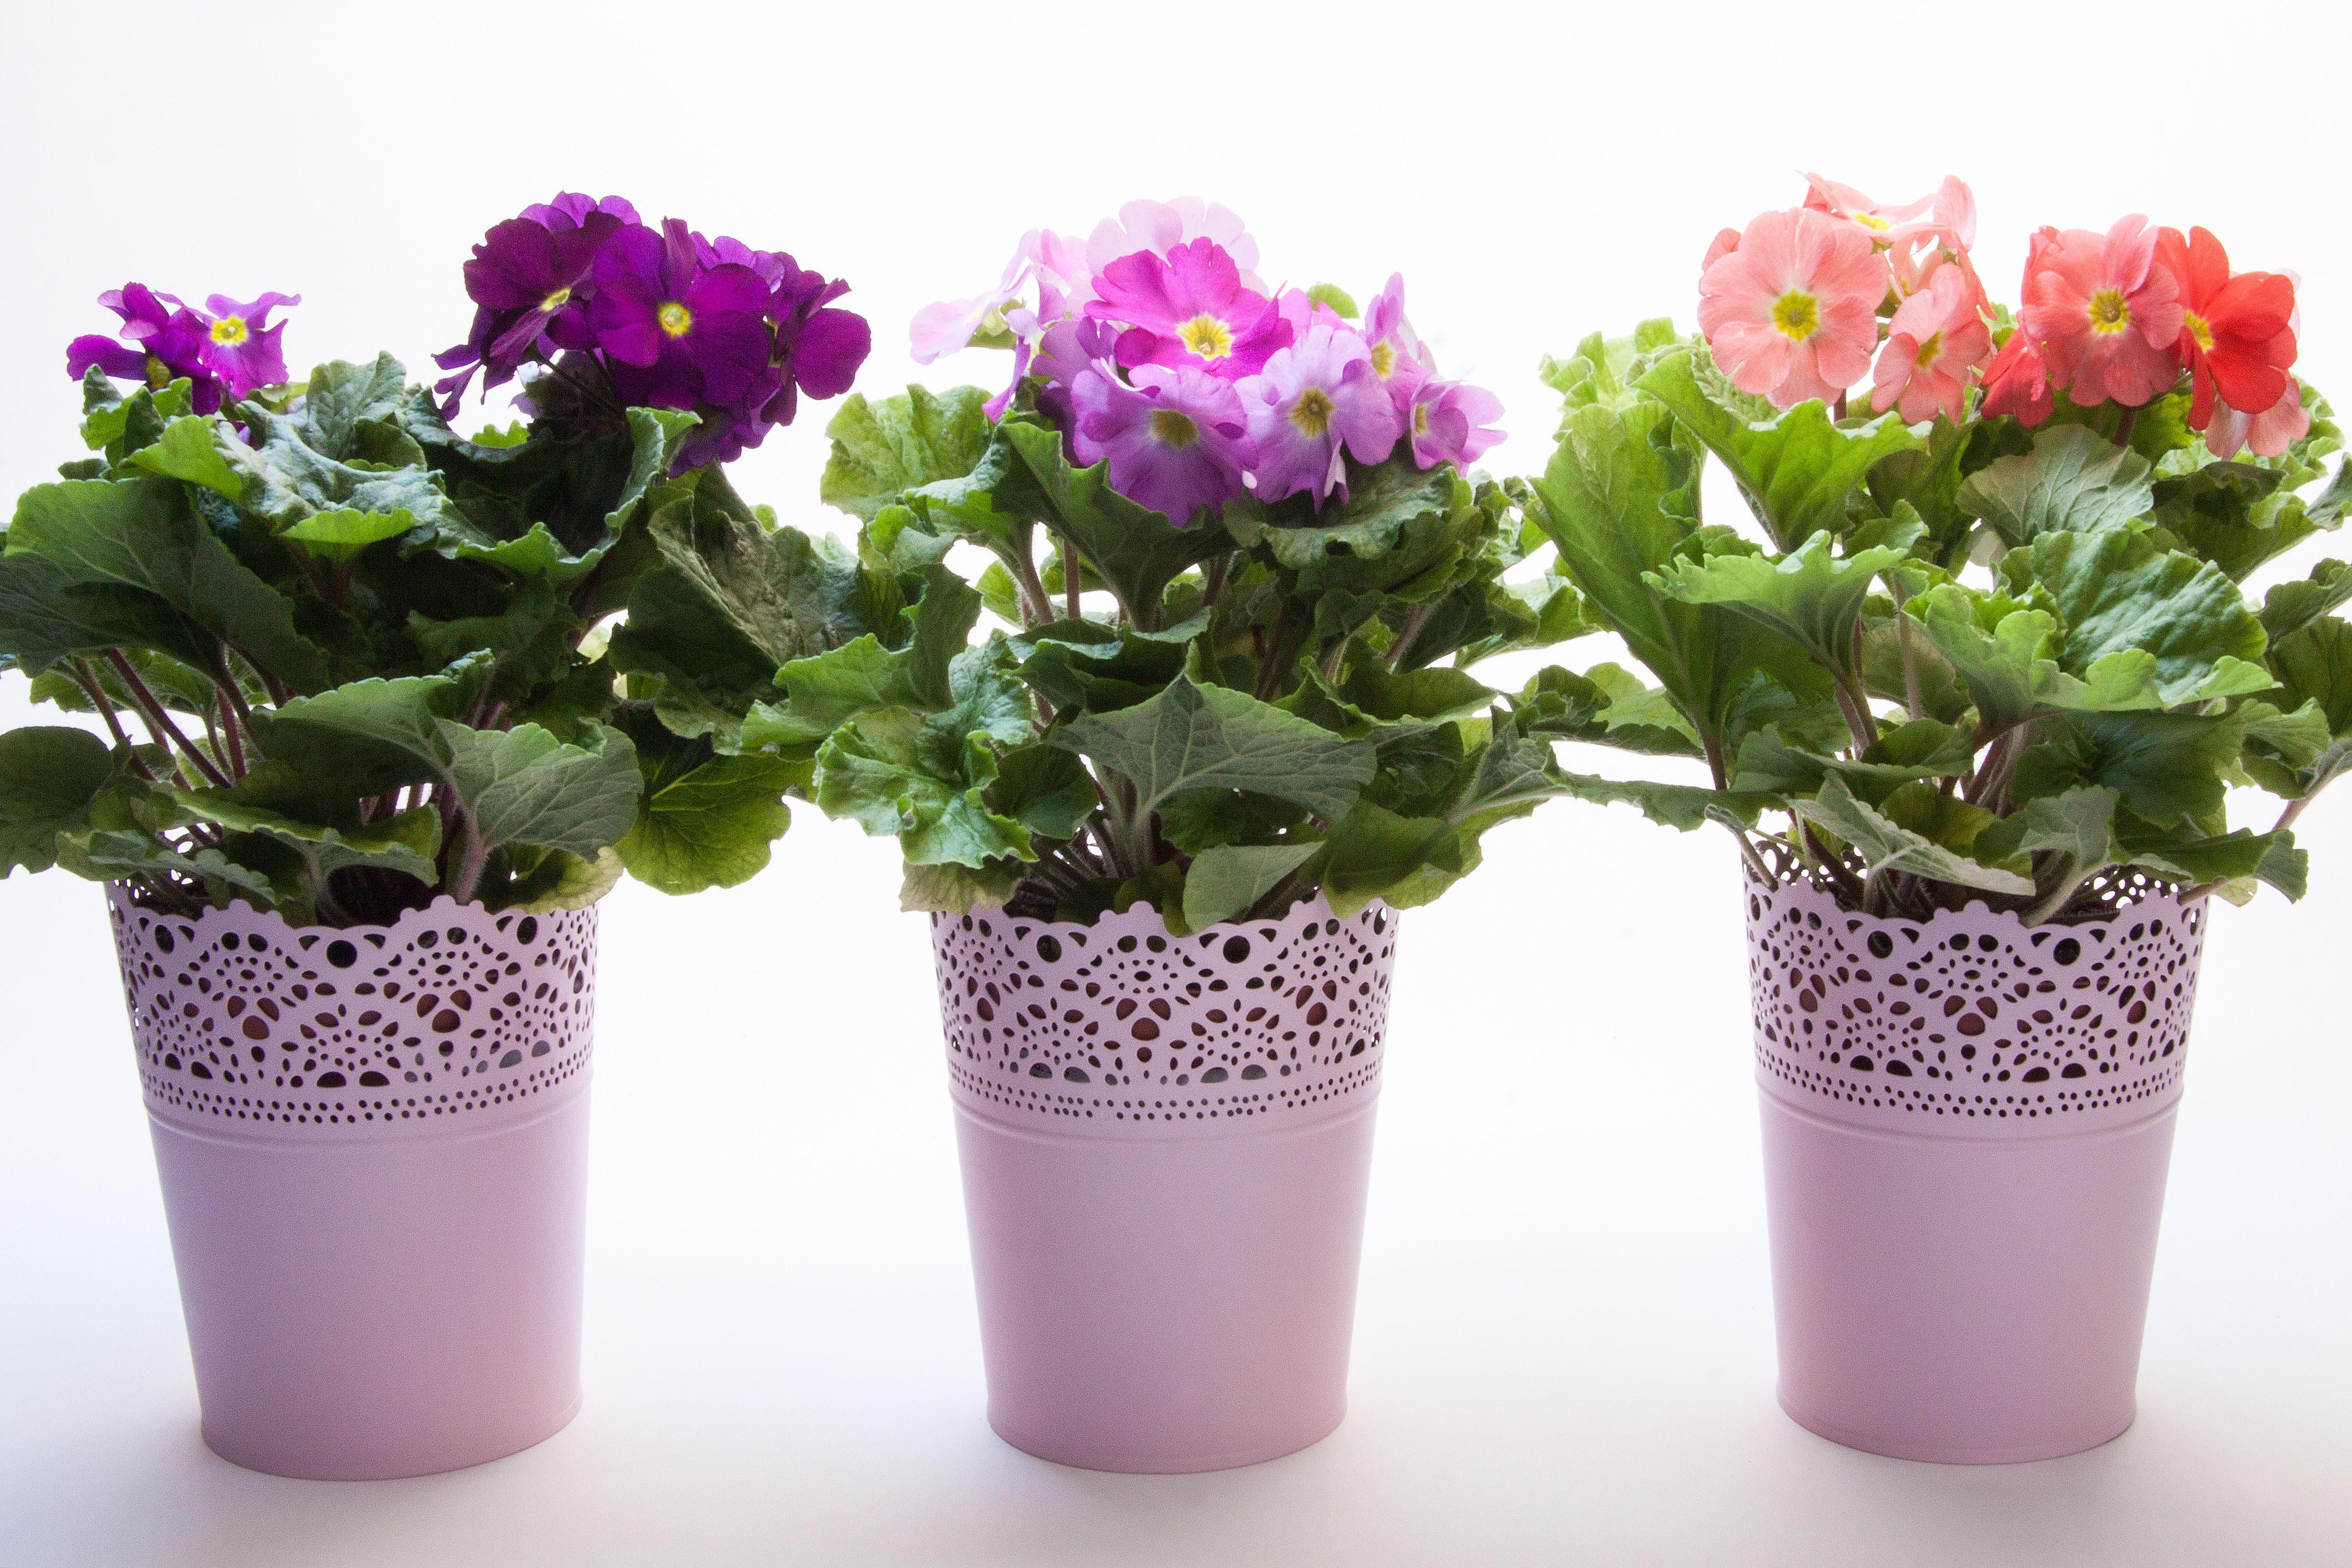 Free Images : spring, shrub, flowerpot, salmon, magenta, cyclamen ...